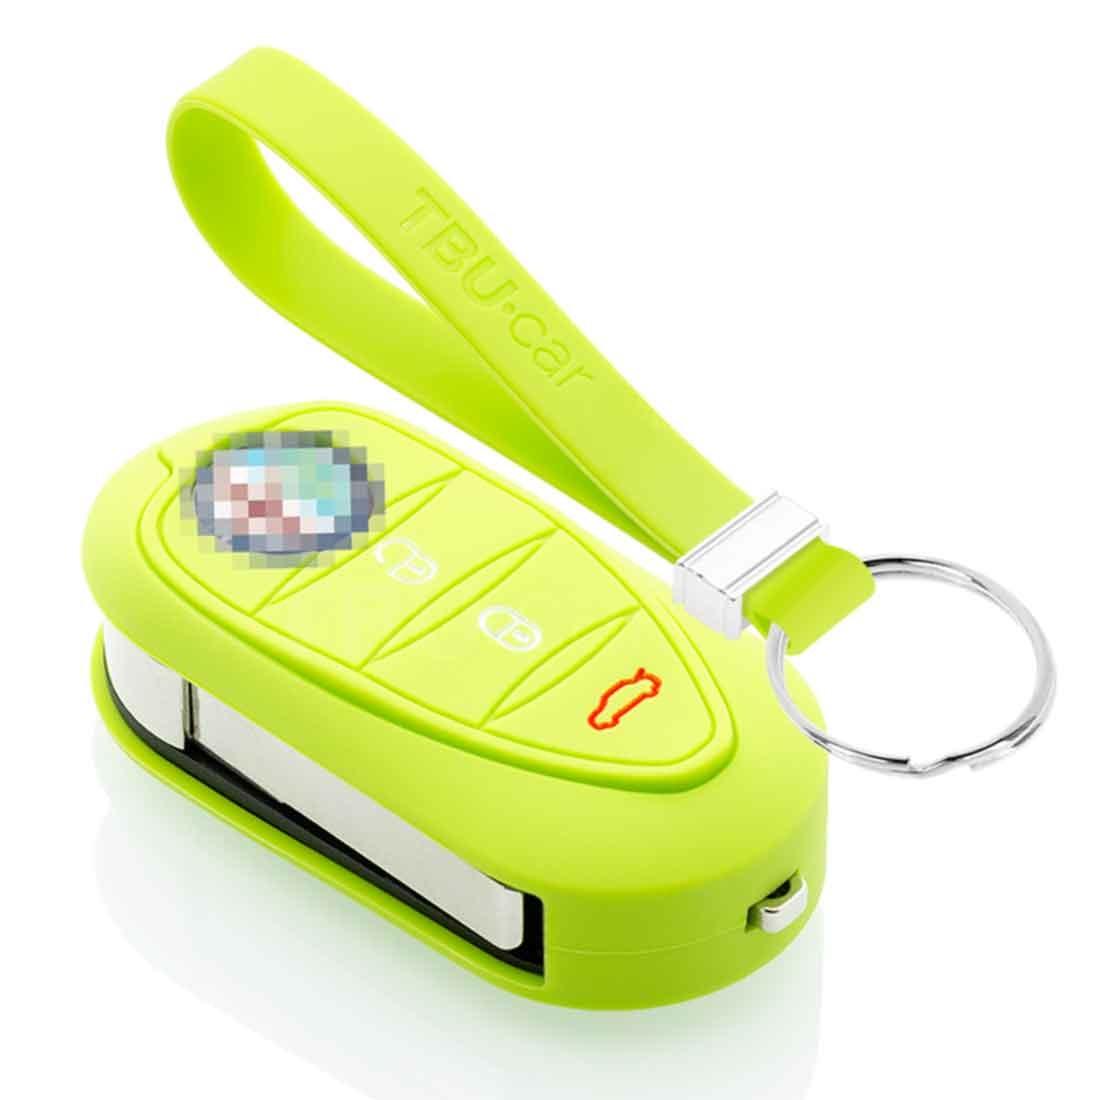 TBU car TBU car Funda Carcasa llave compatible con Alfa Romeo - Funda de Silicona - Cover de Llave Coche - Verde lima